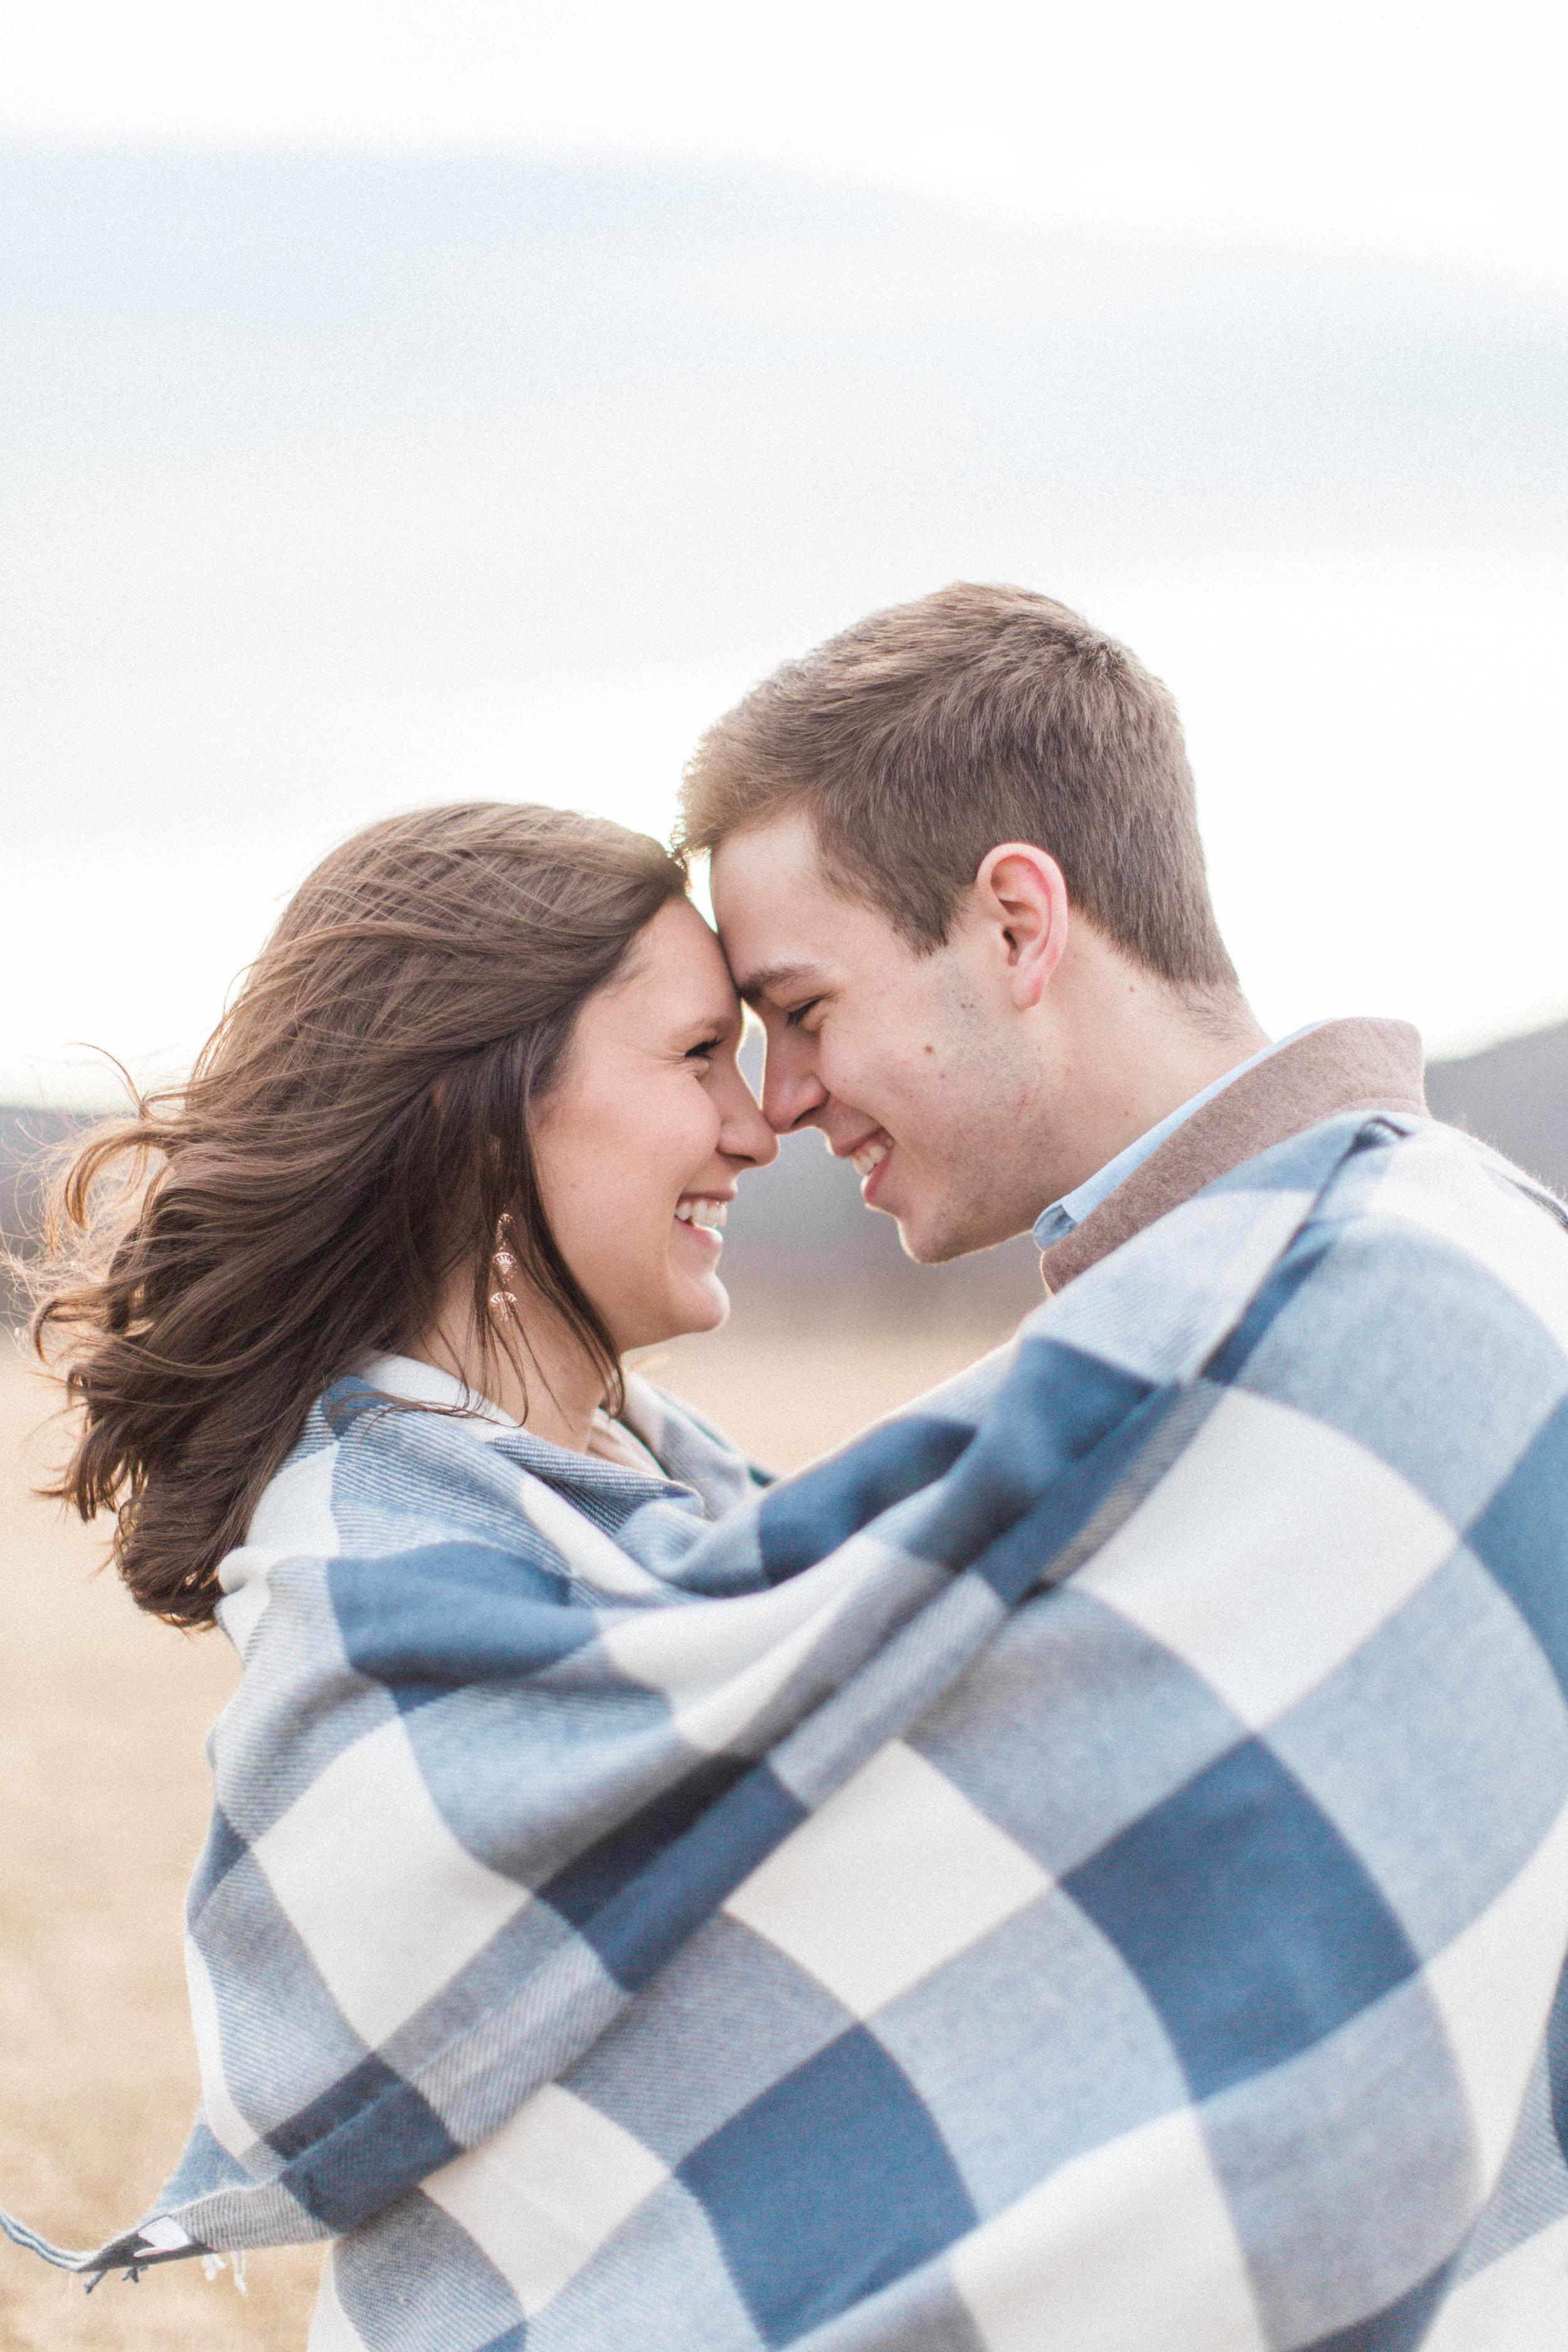 Abigail_Jill_Photography_Maryland_Engagement_Farm_Emily_Justin75.jpg